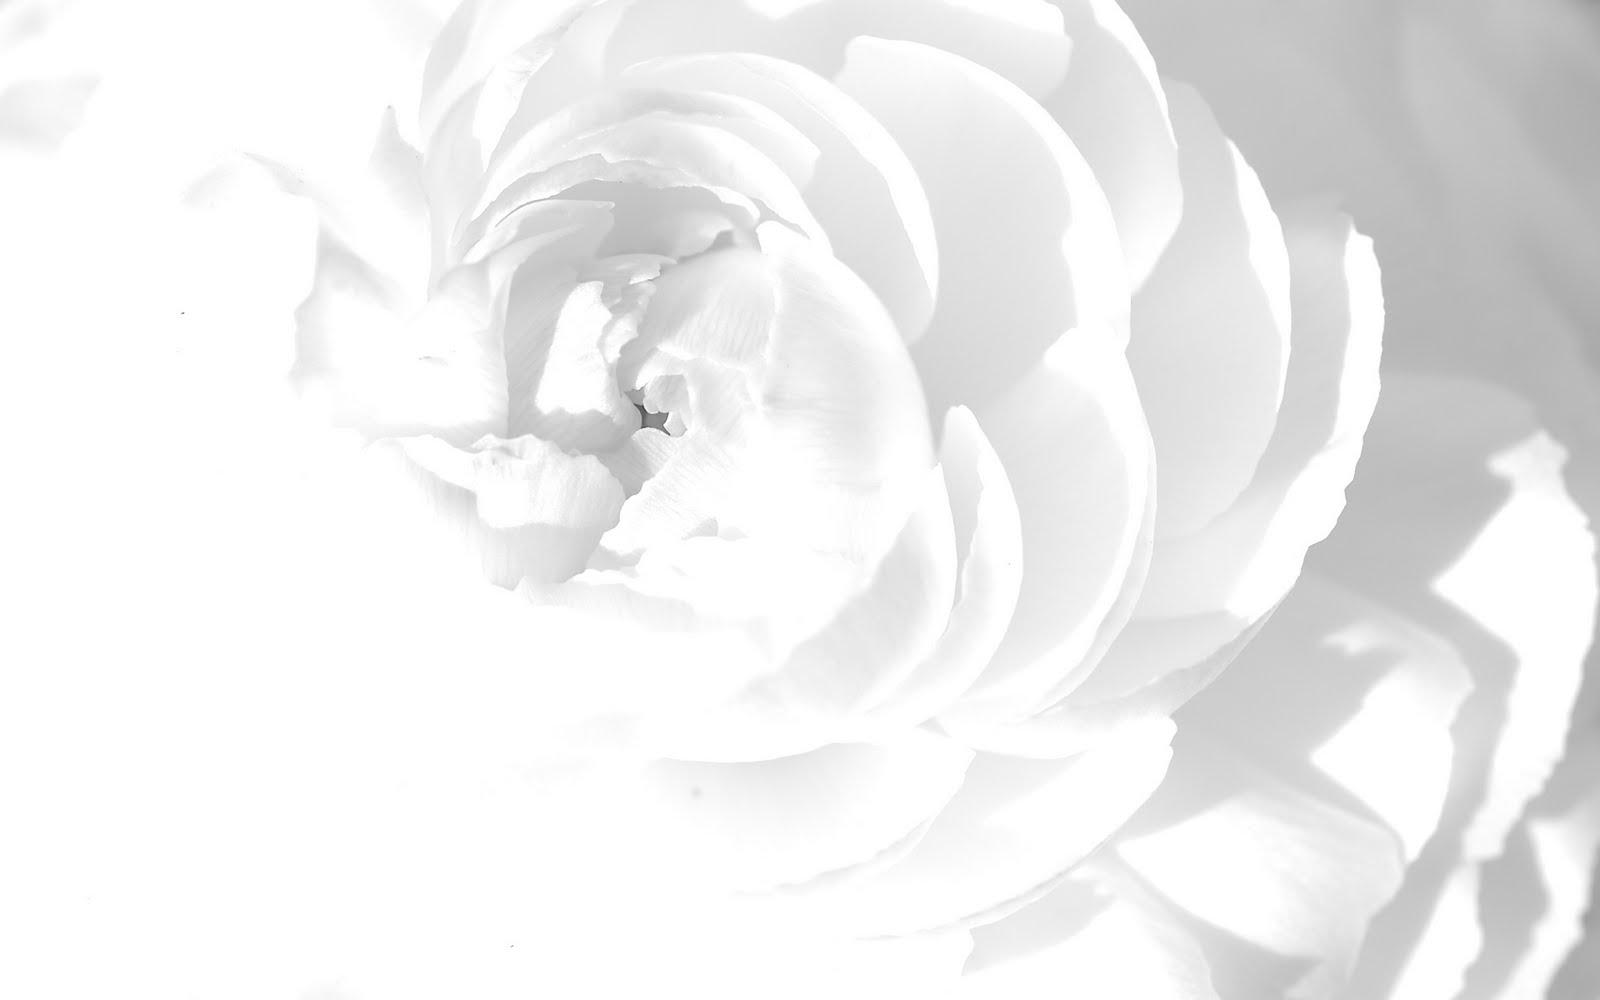 Background Photos Tumblr Black And White Black White Background 2